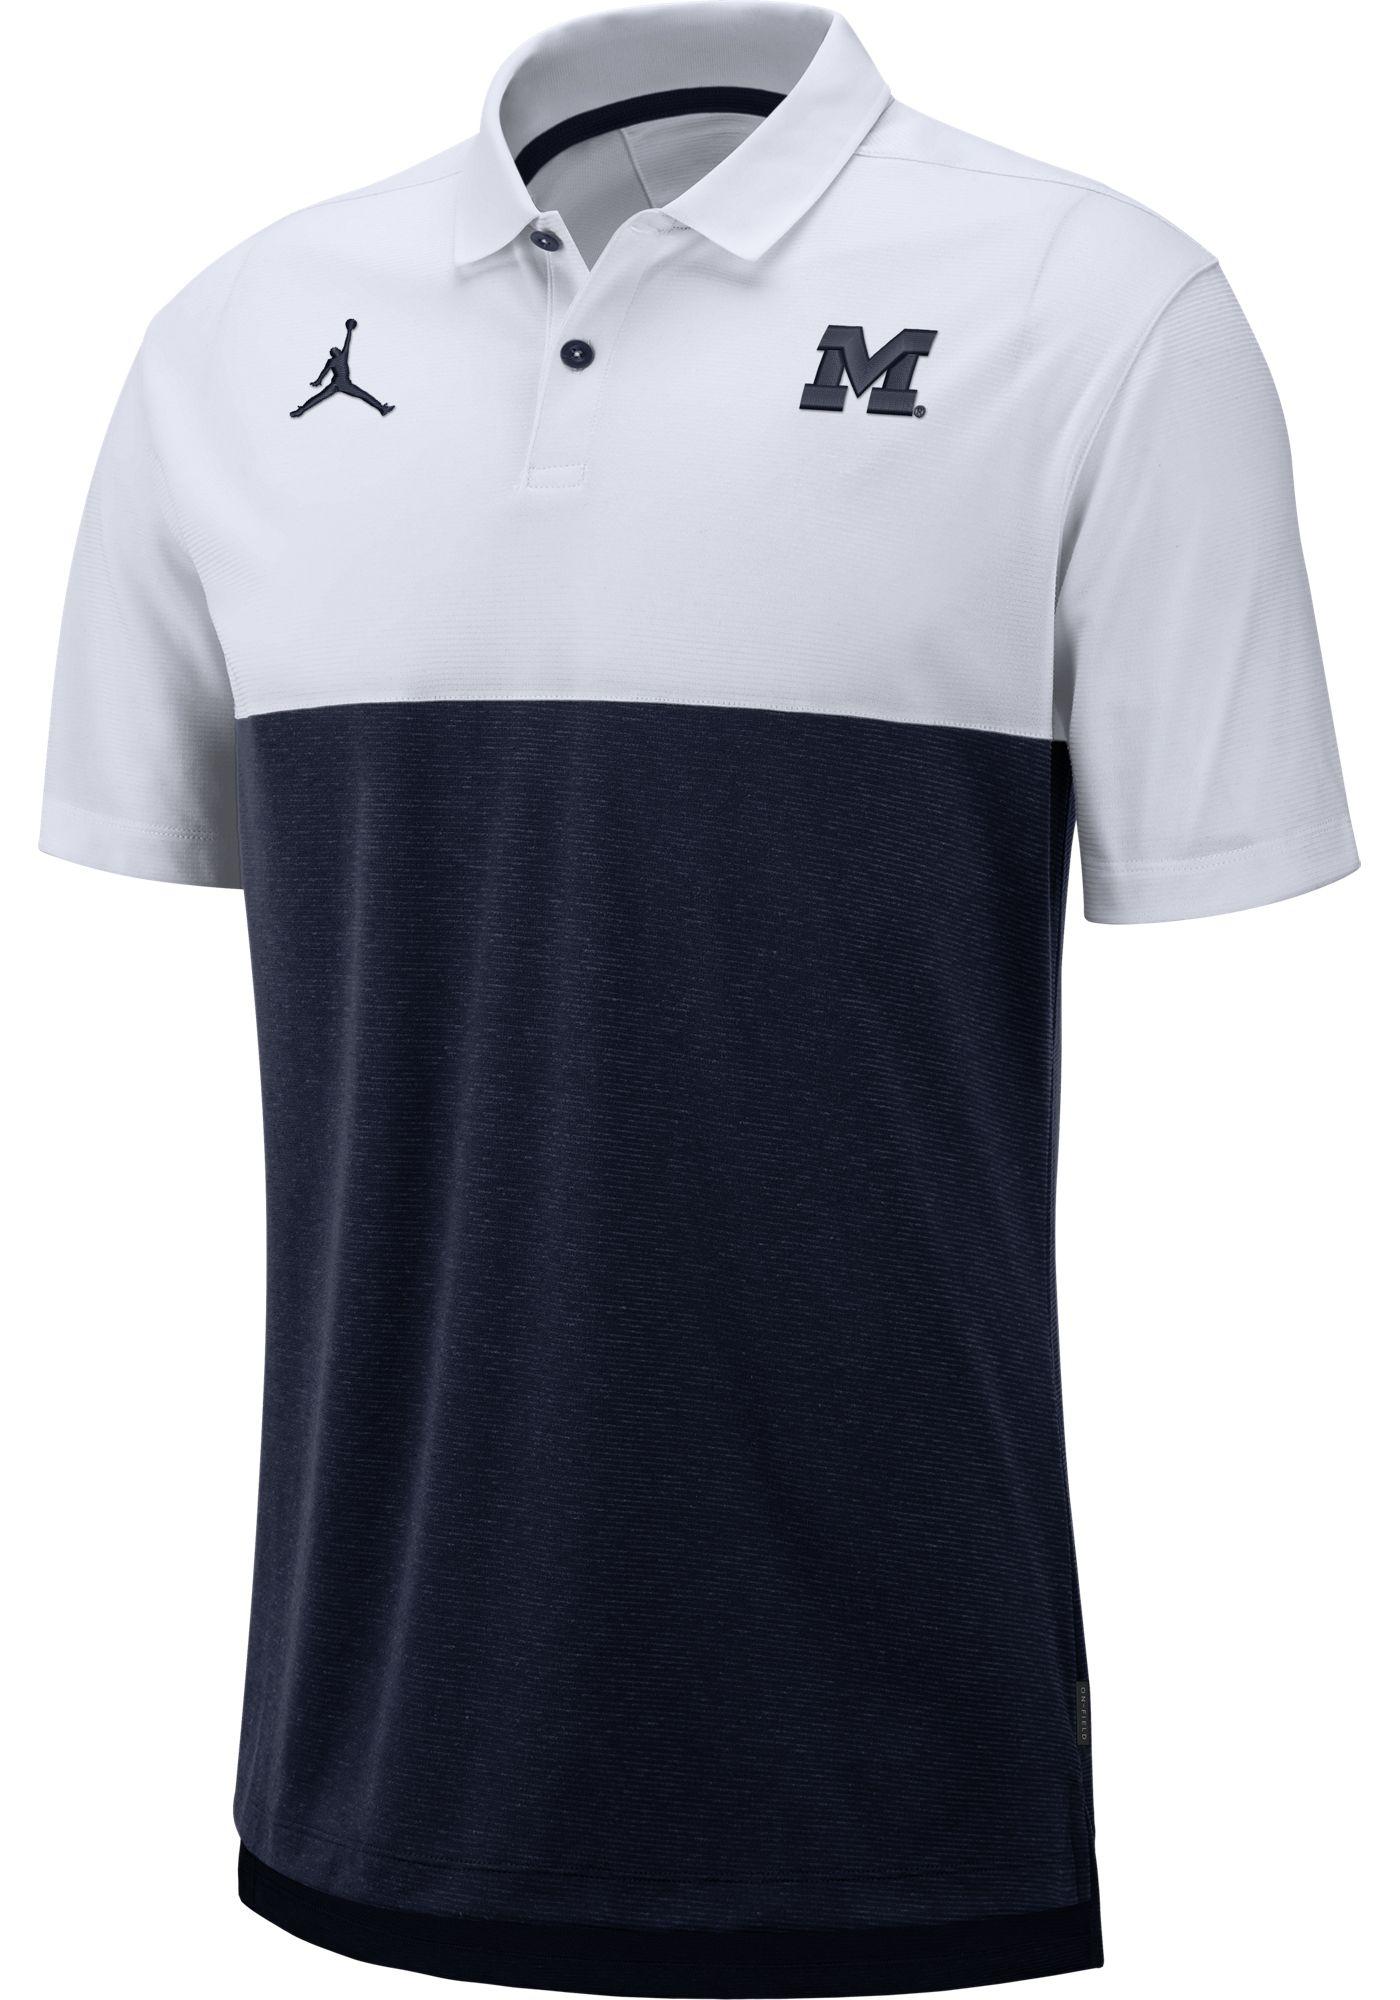 Jordan Men's Michigan Wolverines White/Blue Dri-FIT Breathe Football Sideline Polo